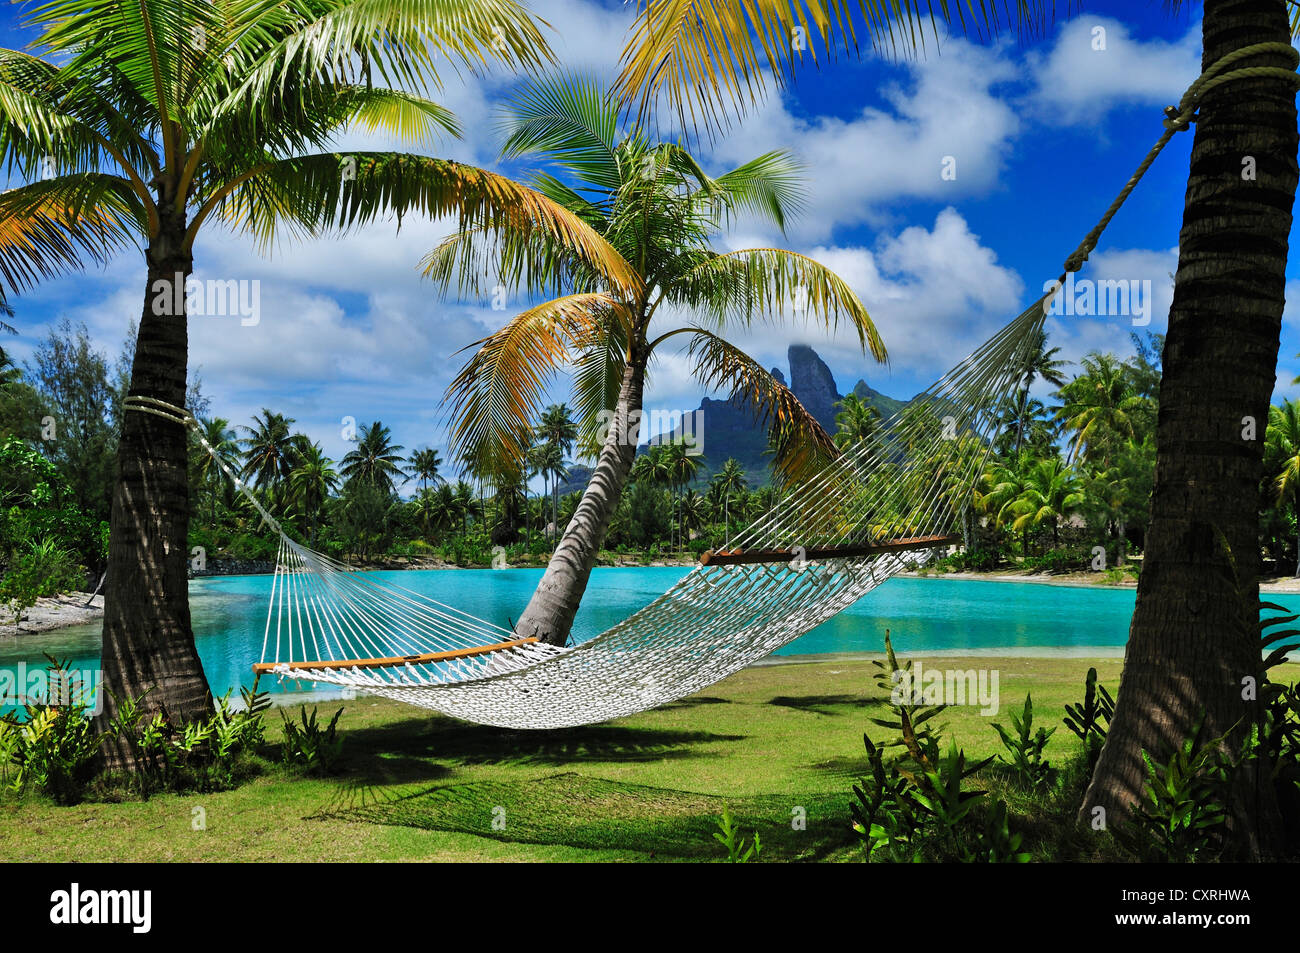 Hammock between palm trees, St. Regis Bora Bora Resort, Bora Bora, Leeward Islands, Society Islands, French Polynesia - Stock Image